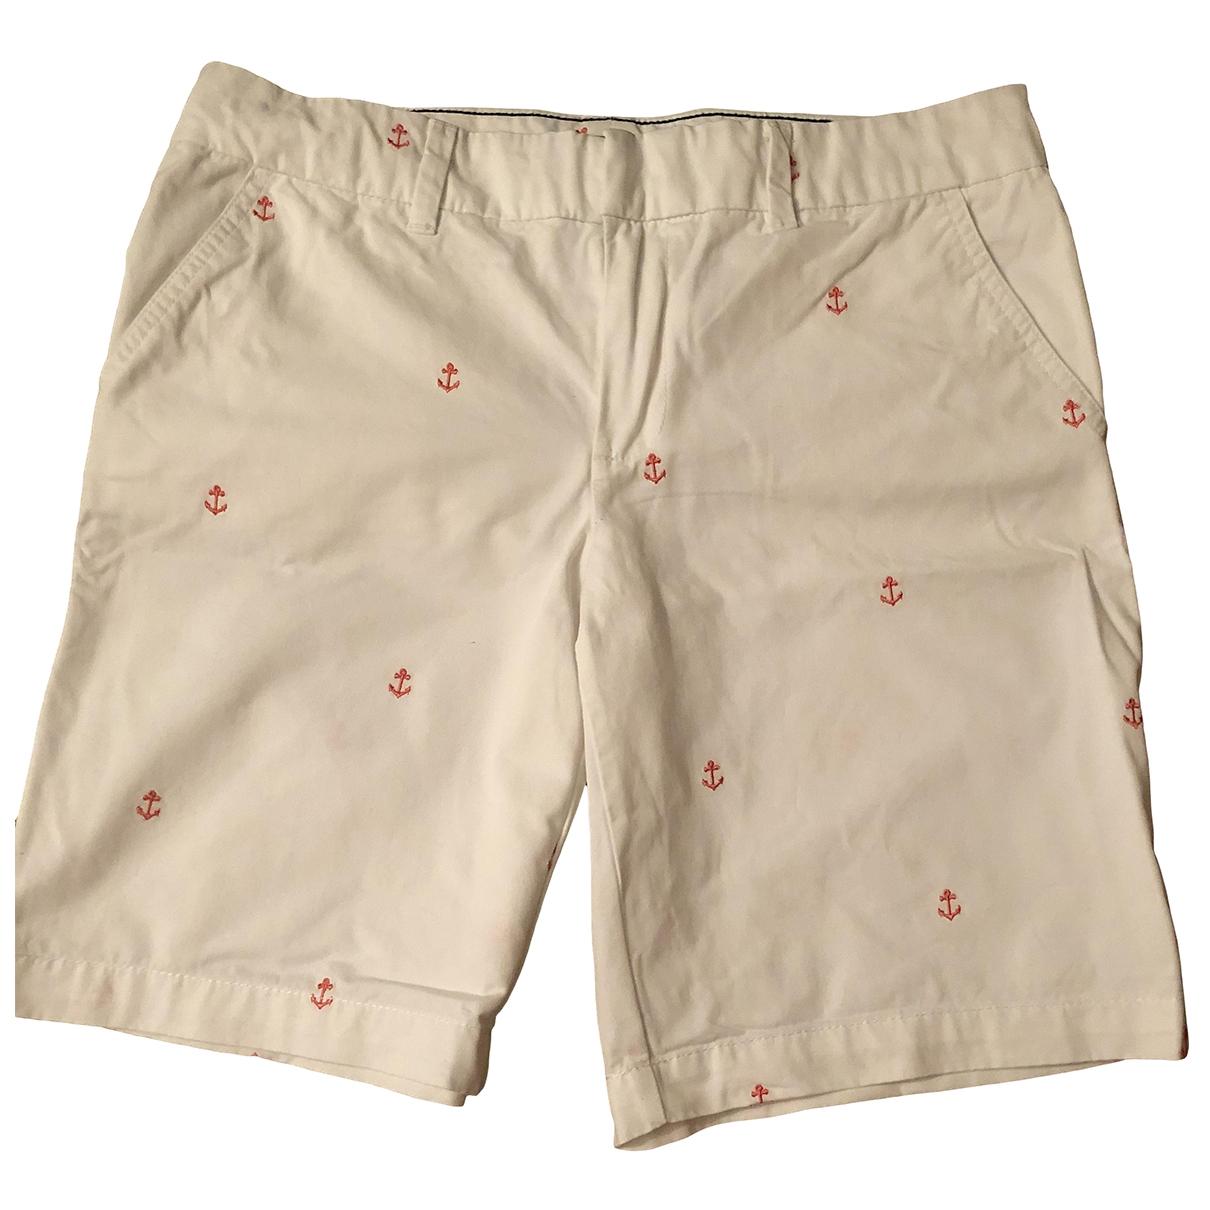 Tommy Hilfiger \N Shorts in  Weiss Baumwolle - Elasthan